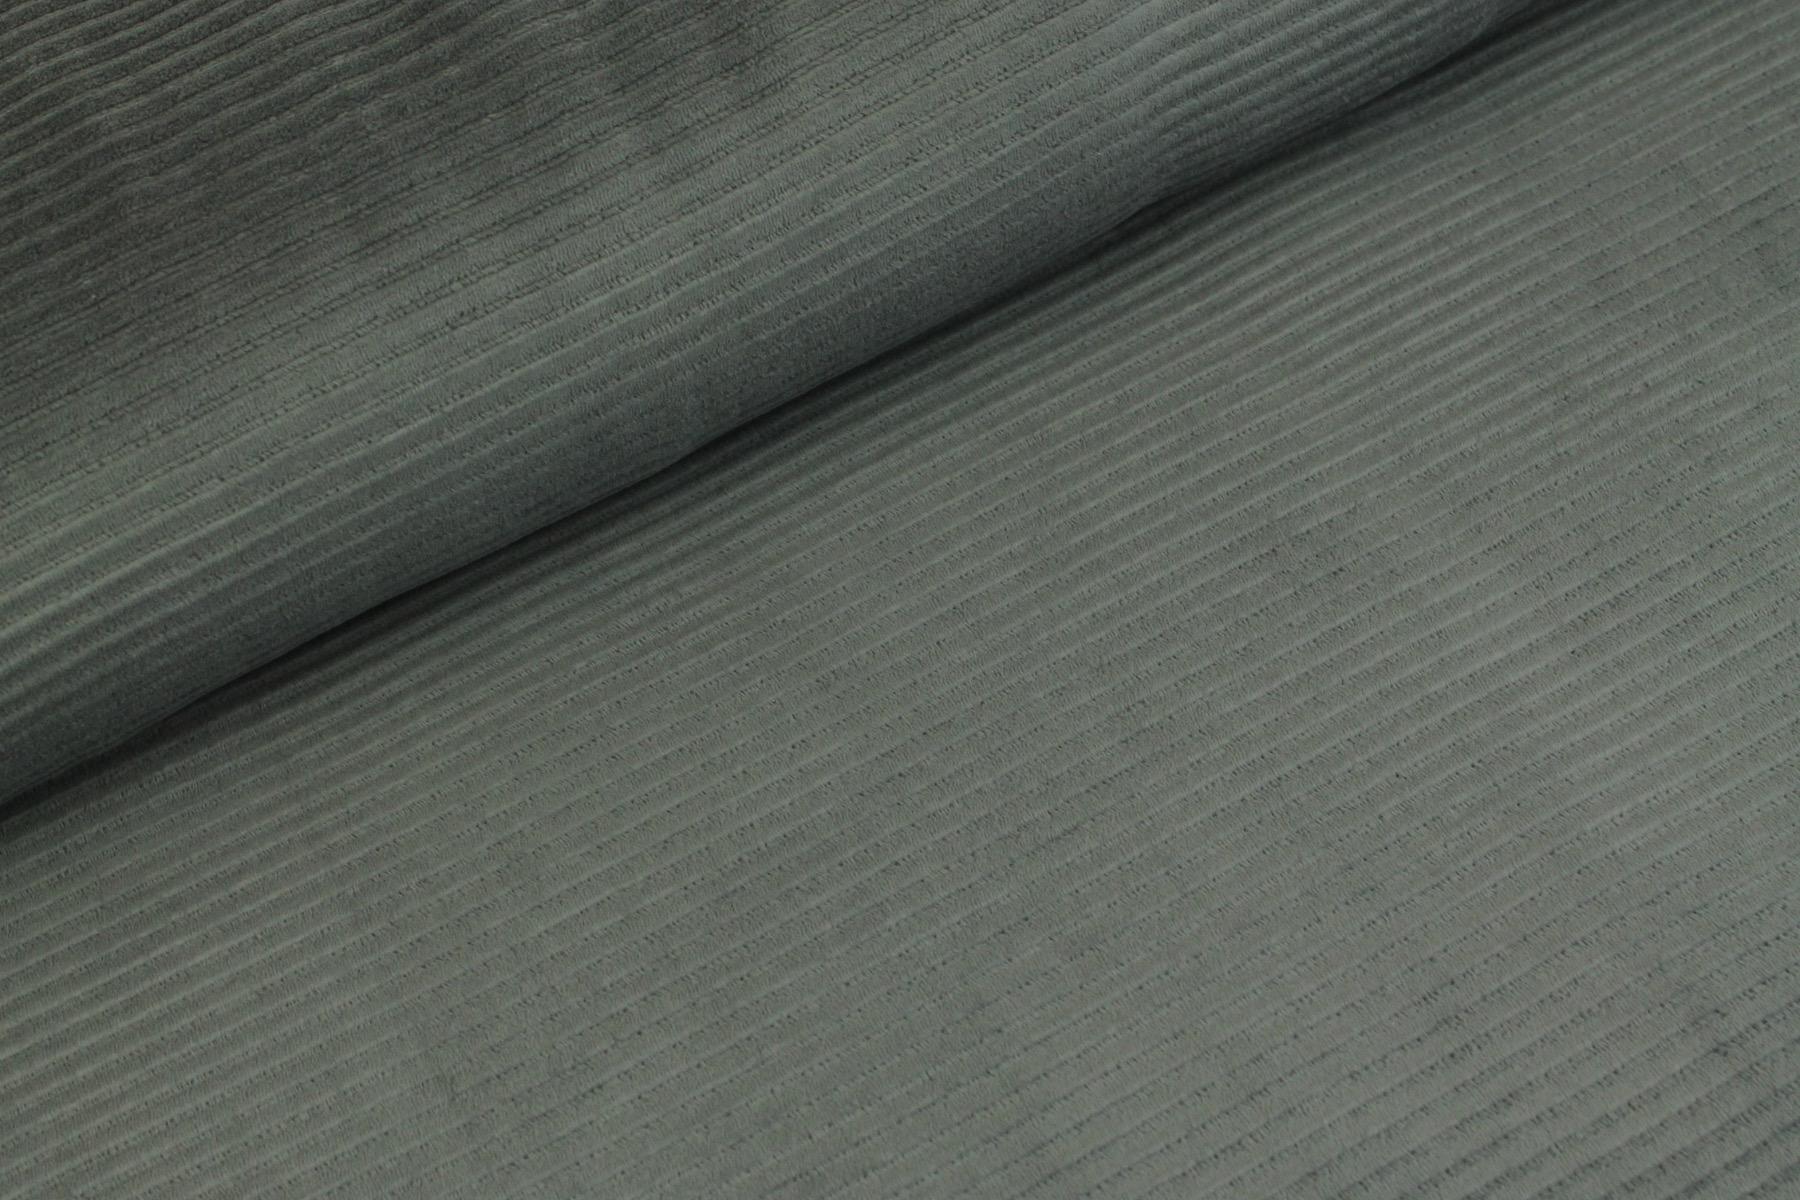 Cotton Knit Big Cord - Antraciet